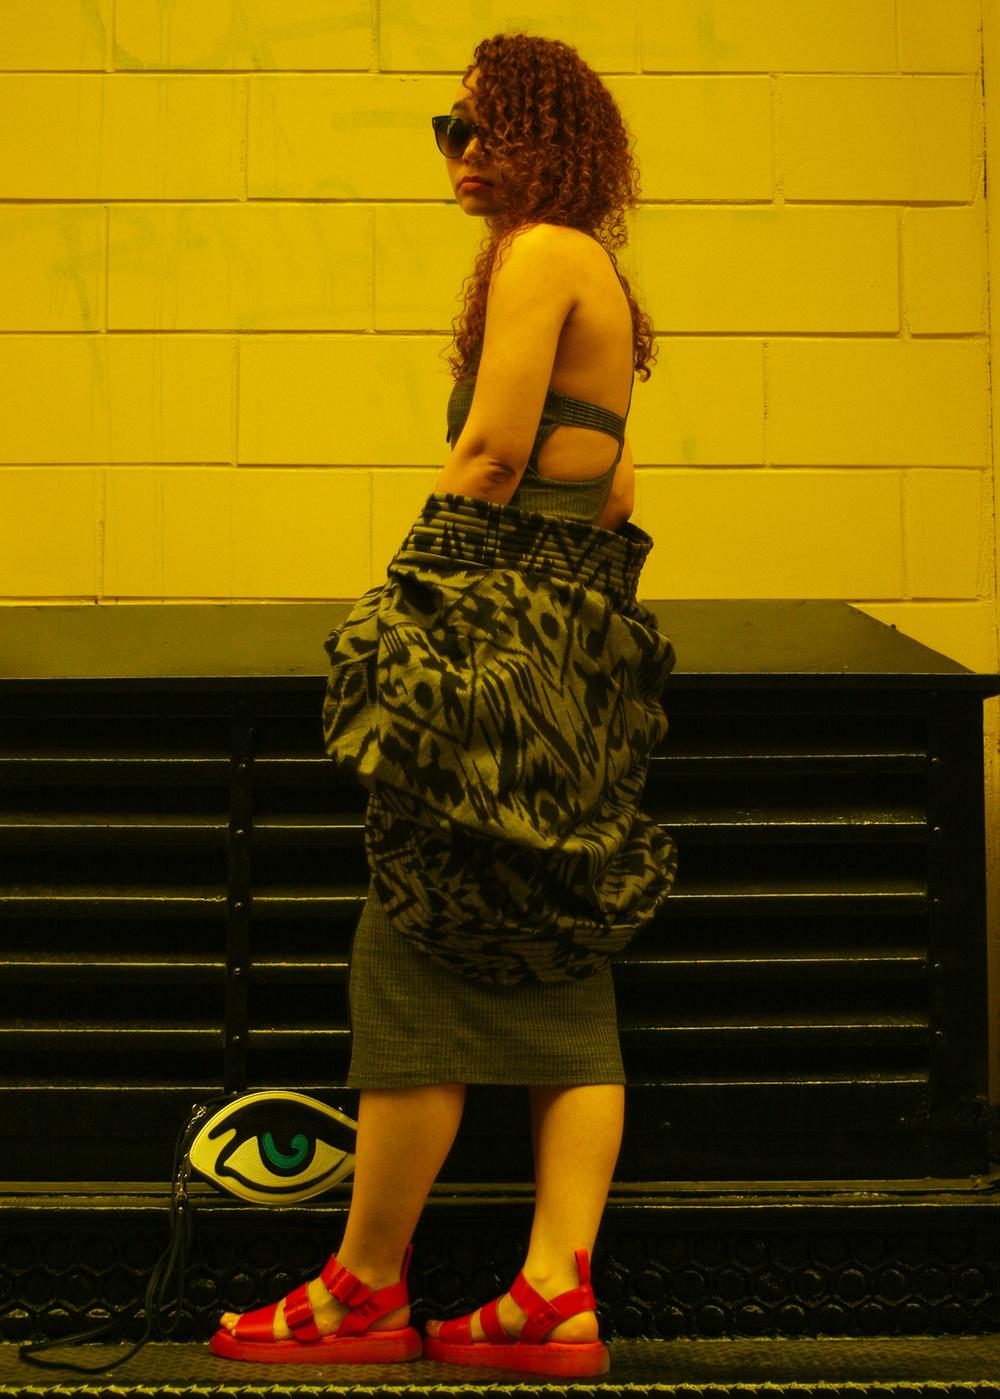 Kimono Backstreets - Athletic Clothes mixed with Graphic Kimonos Image 3